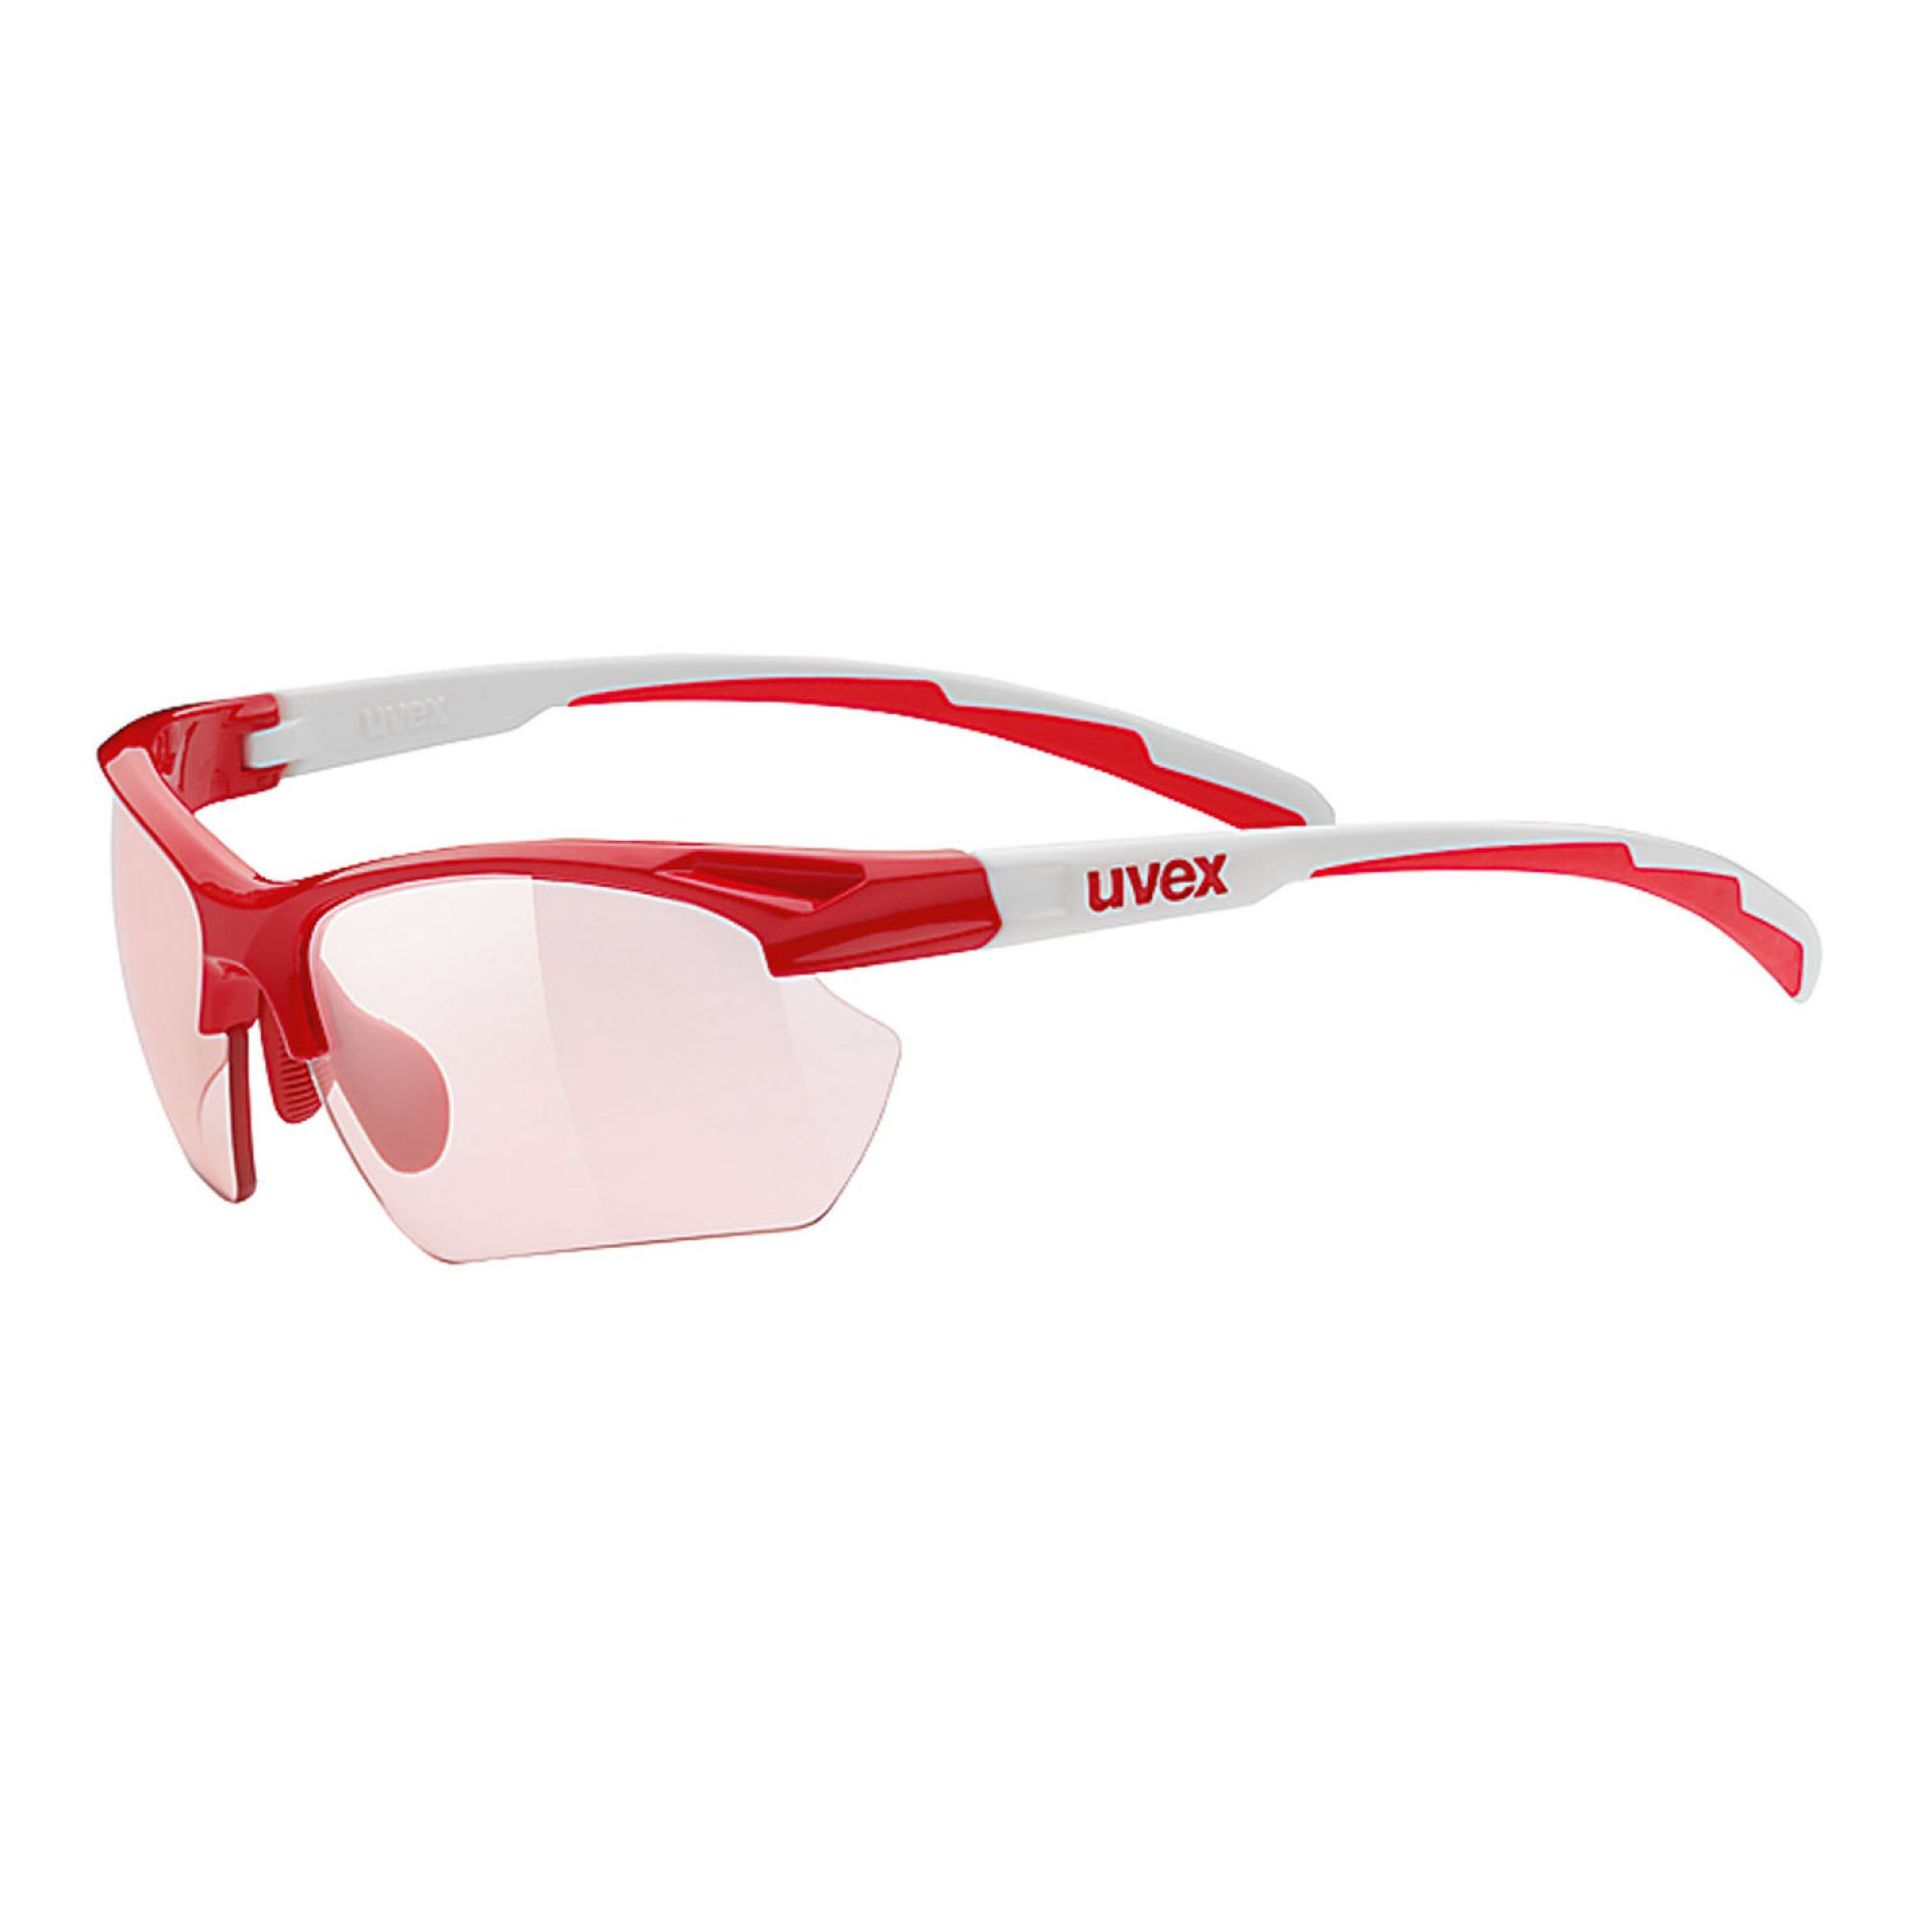 OKULARY UVEX SPORTSTYLE 802 SMALL RED WHITE